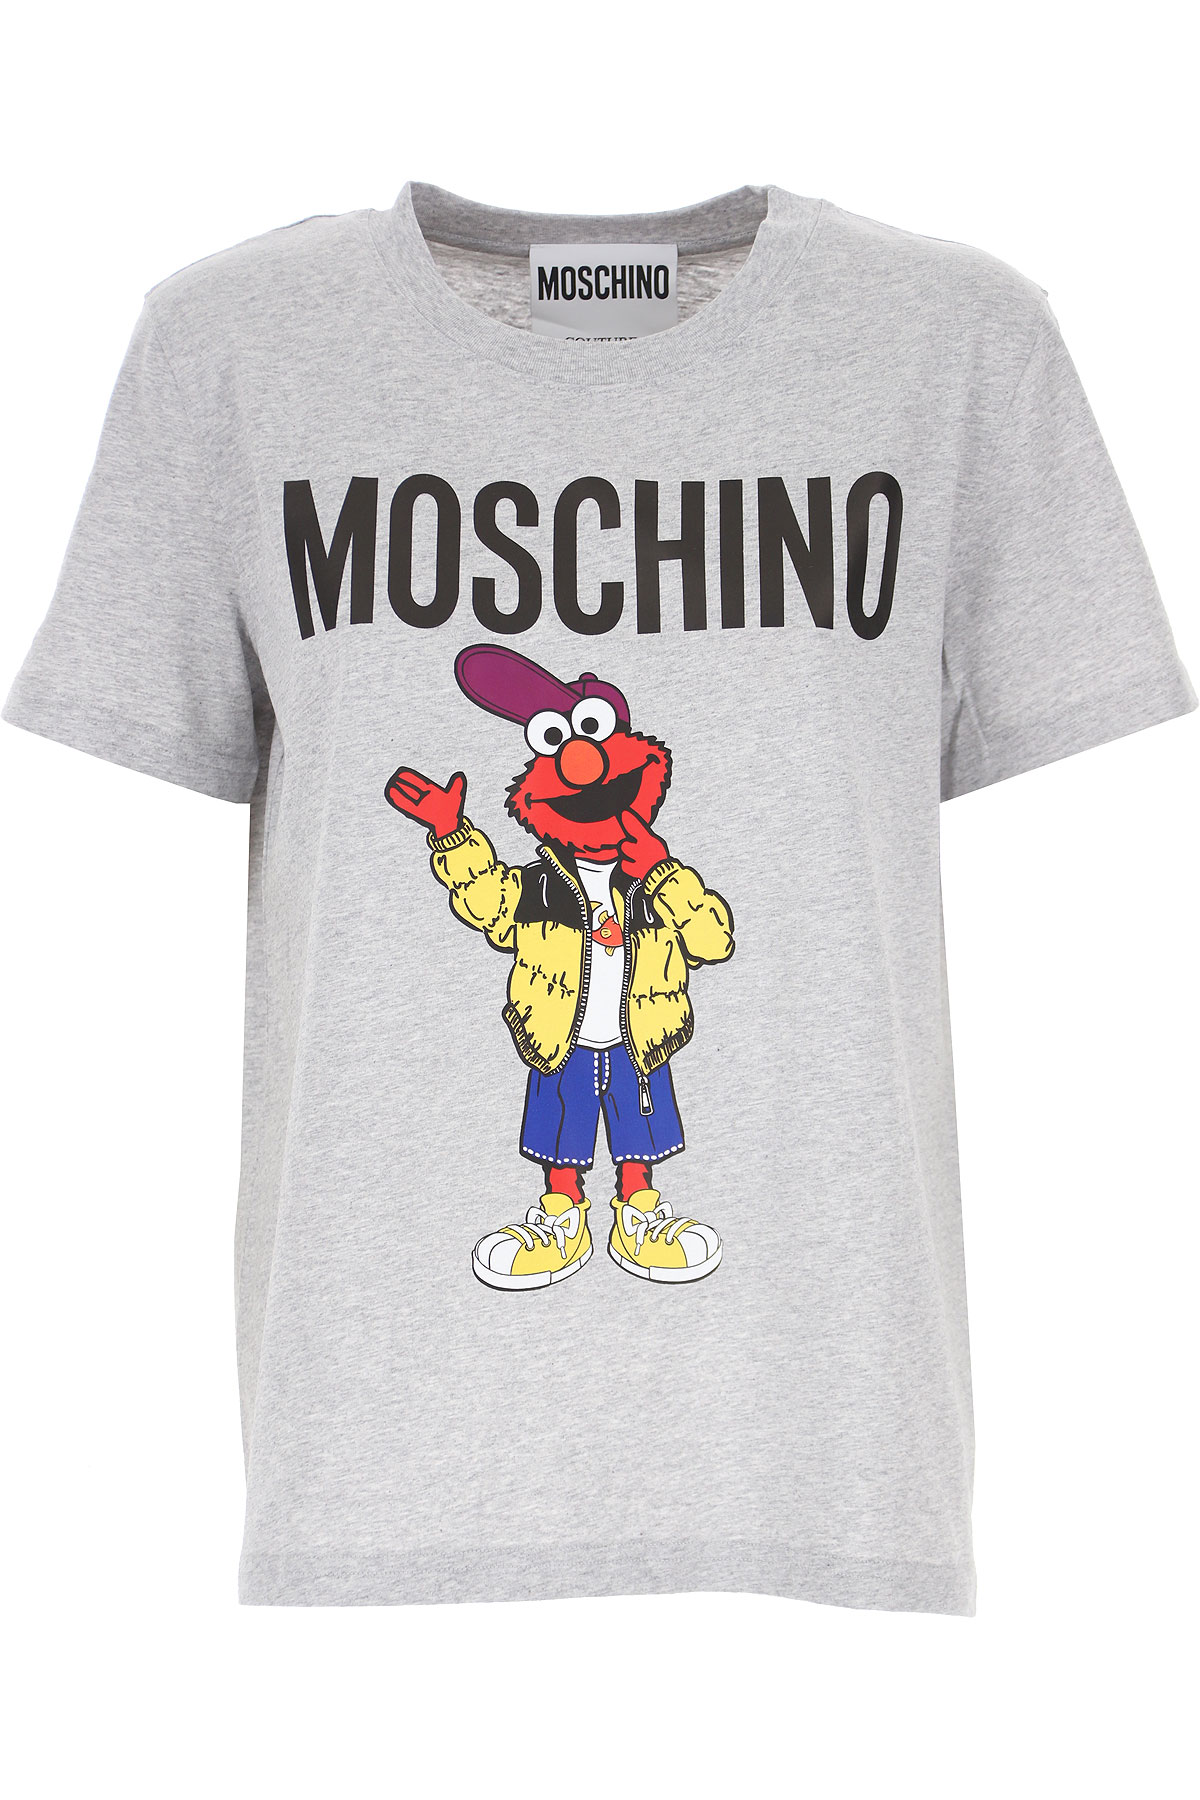 Moschino T-shirt Femme, Gris, Coton, 2021, 38 40 46 M